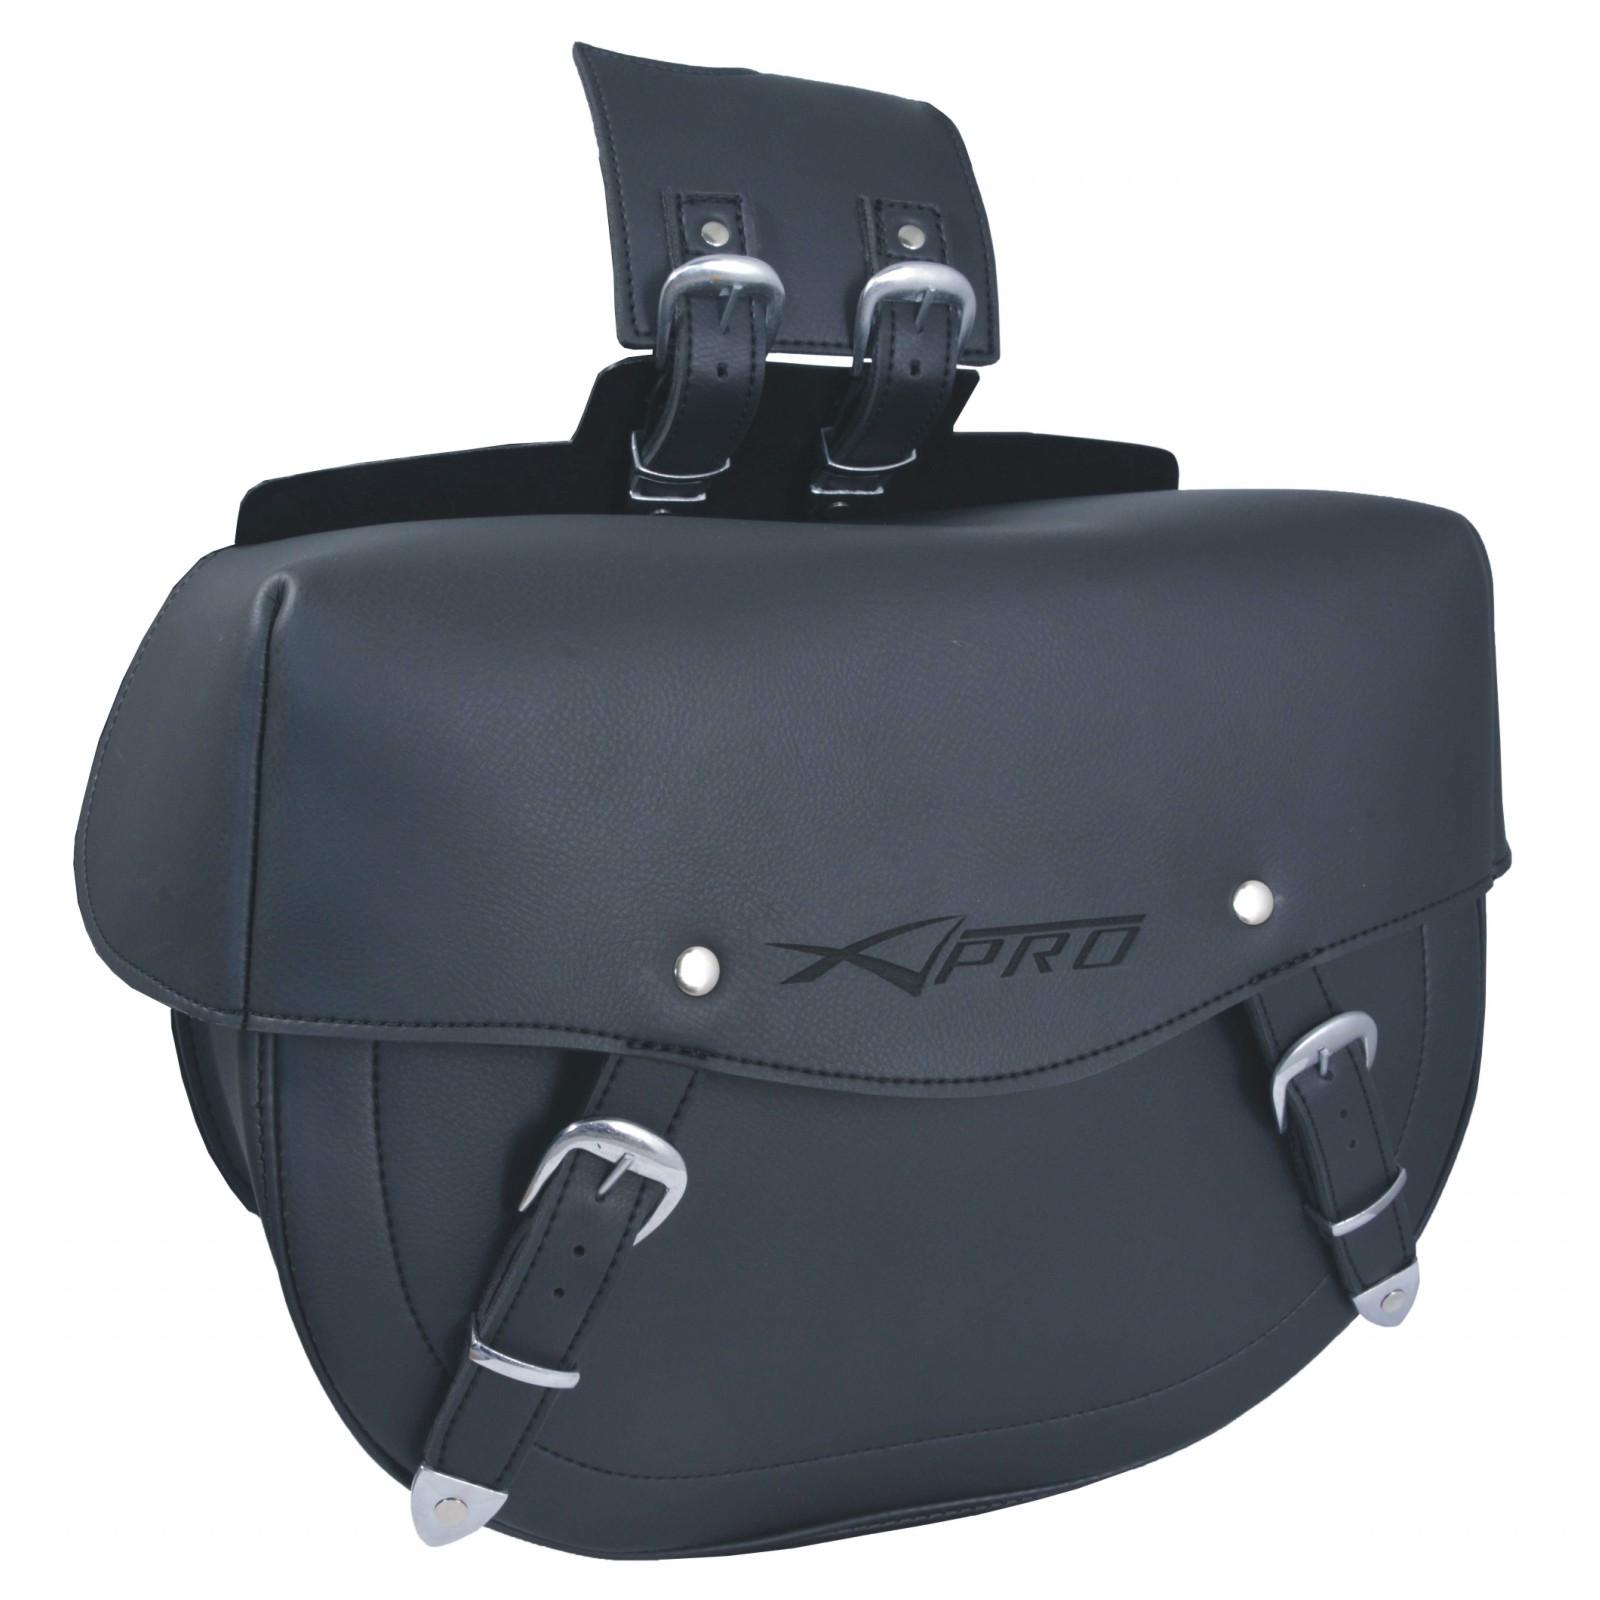 BigTail_Borsa_Bag_Moto-Motorcyle